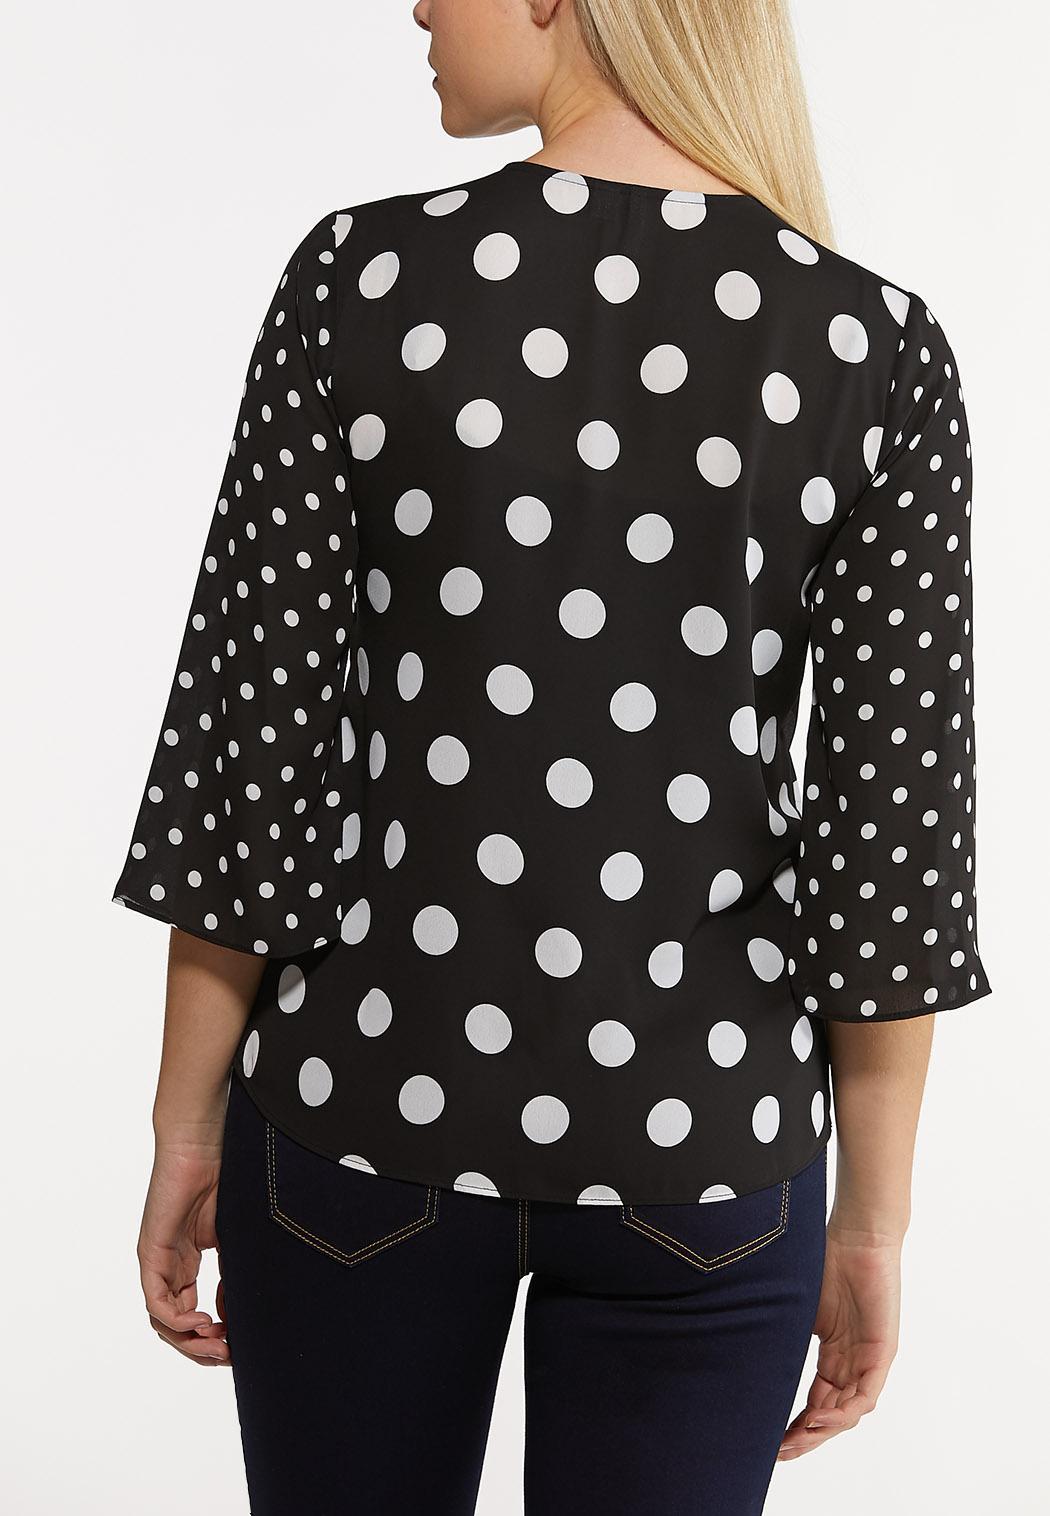 Plus Size Black And White Polka Dot Shirt (Item #44186625)